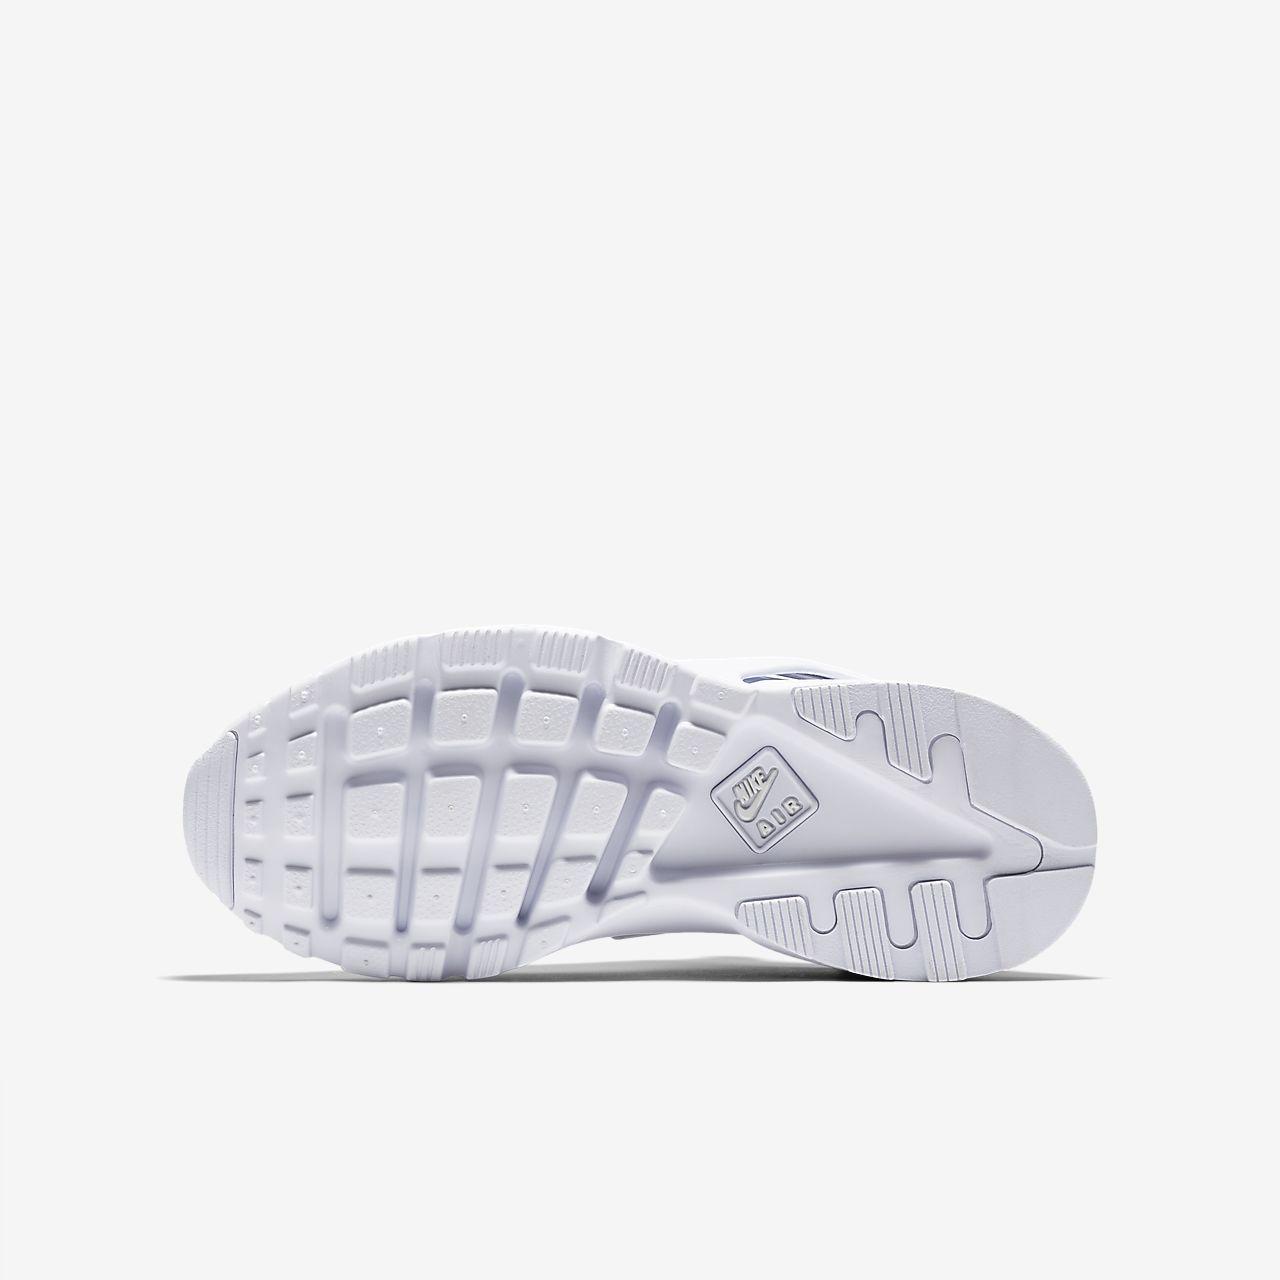 922c4c7d743 Nike Air Huarache Ultra Older Kids  Shoe. Nike.com GB